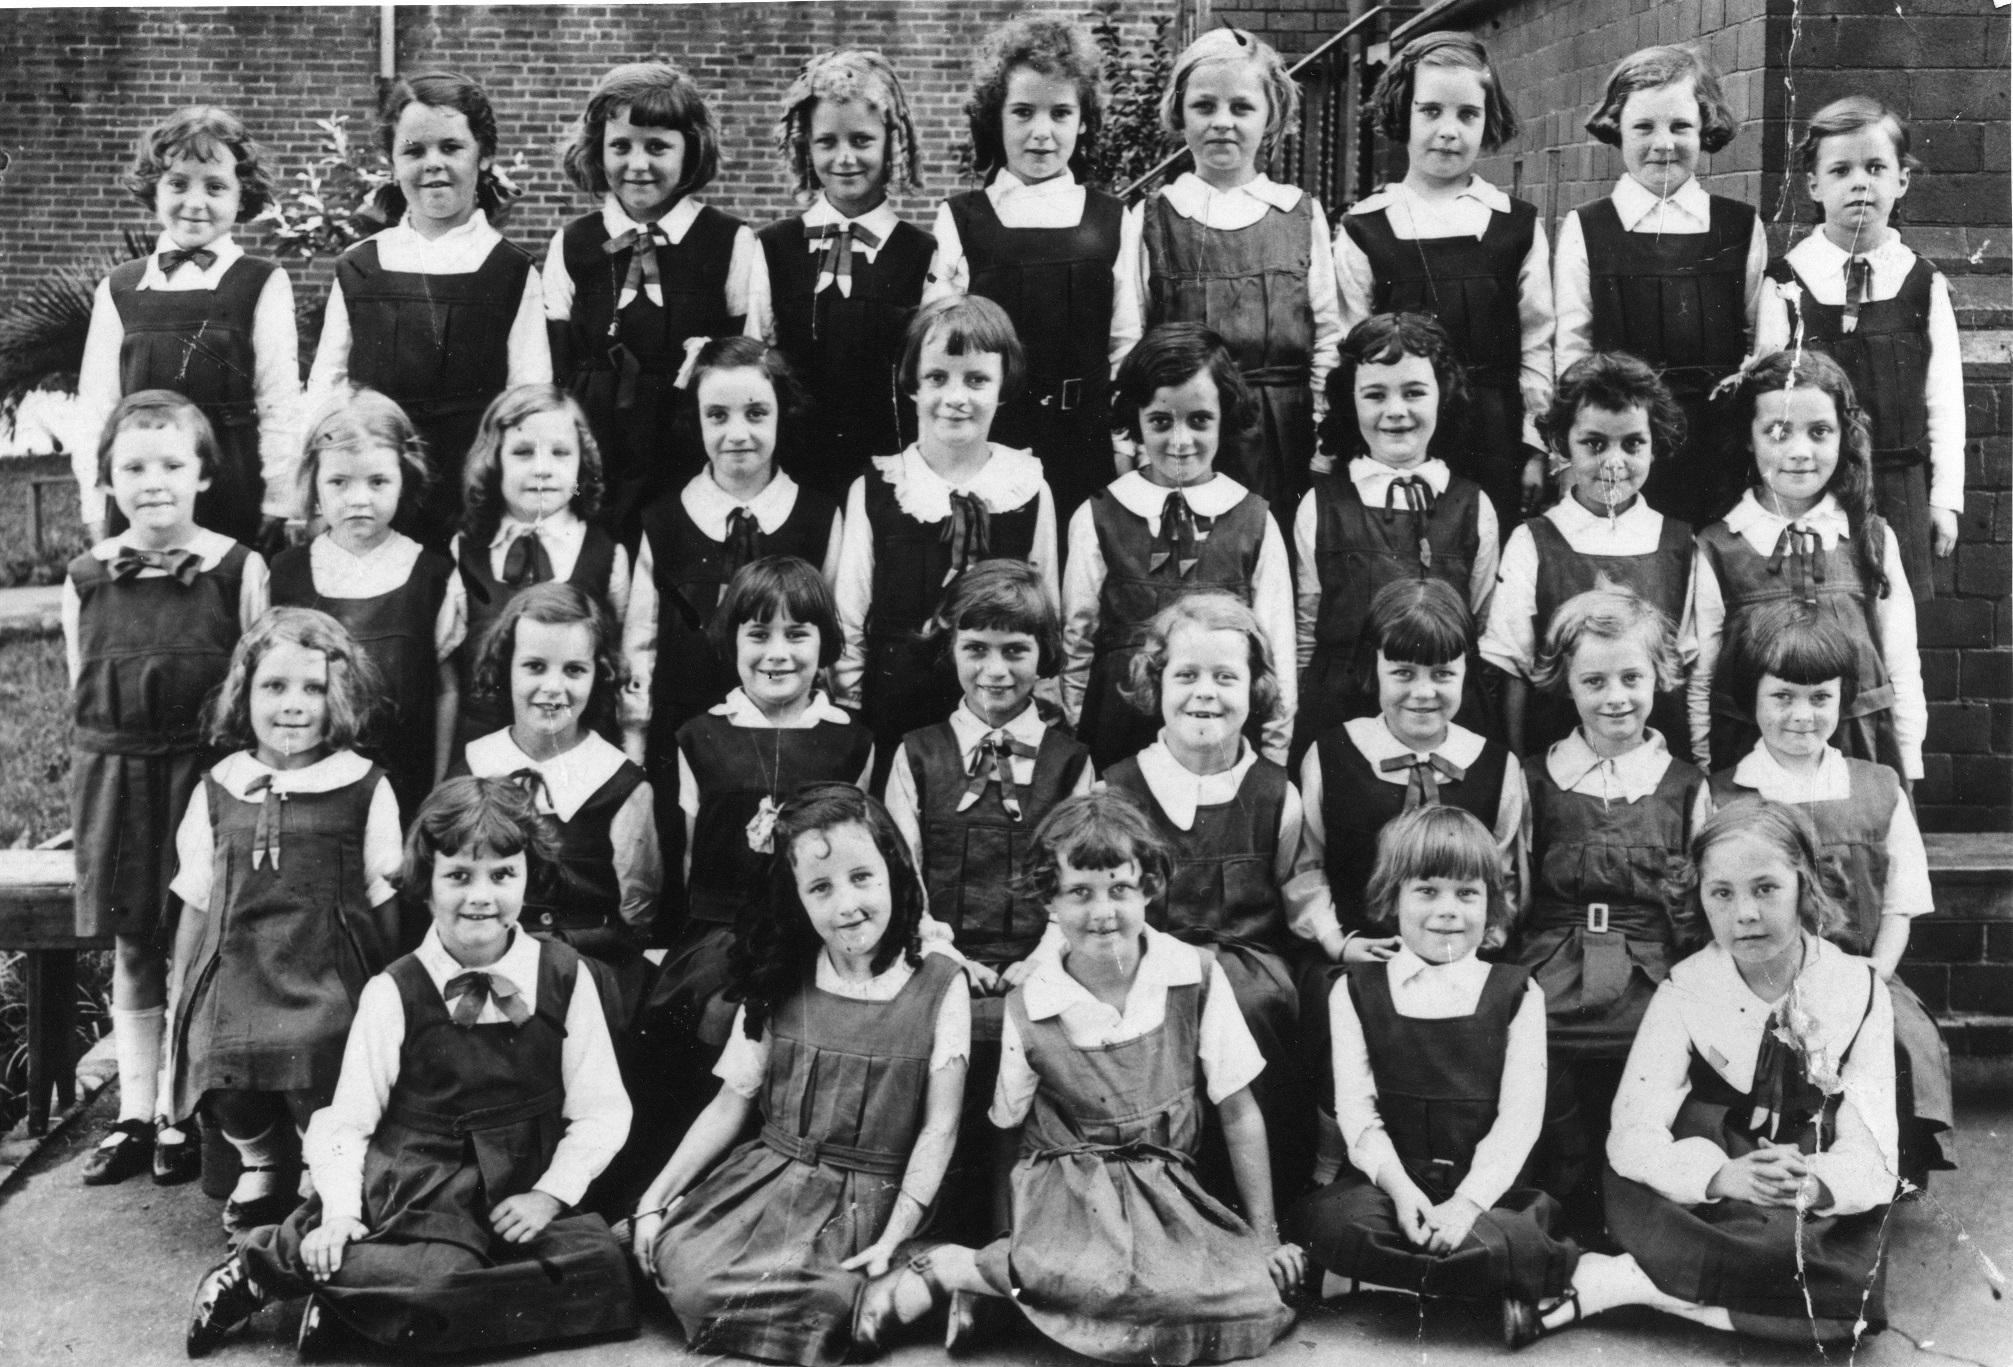 St James Catholic Primary School Forest Lodge girls student circa 1927-1928